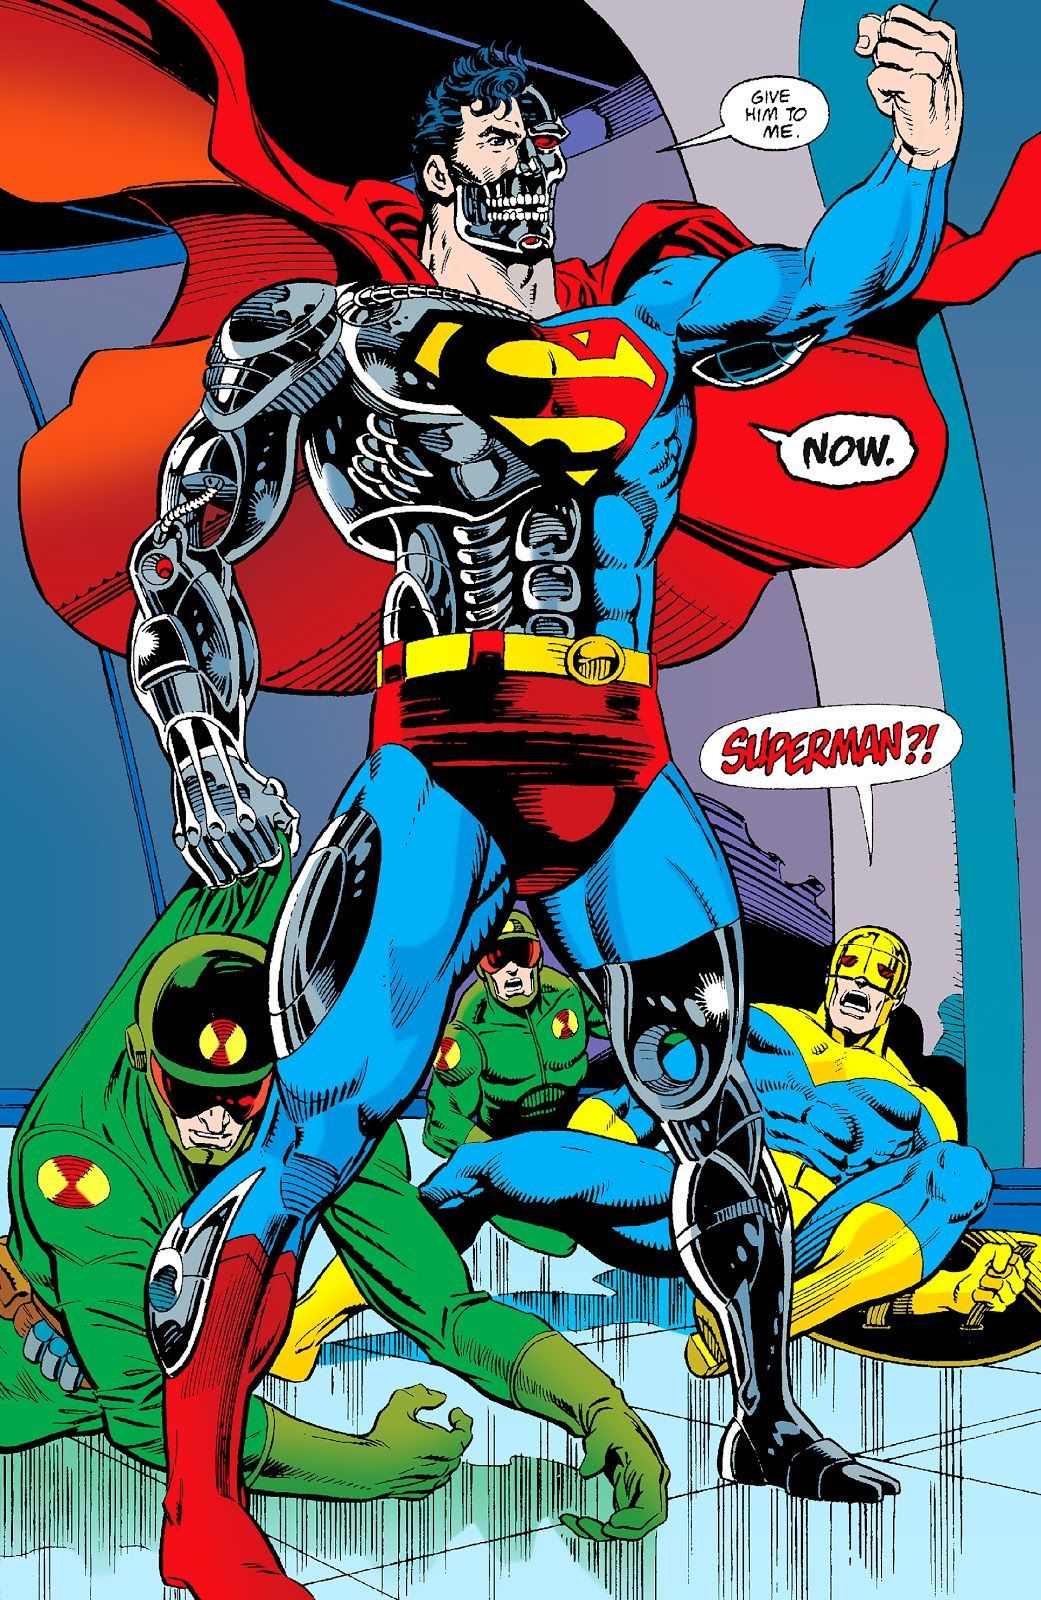 Superman #78 (Art and layout by Dan Jurgens, finished by Brett Breeding)